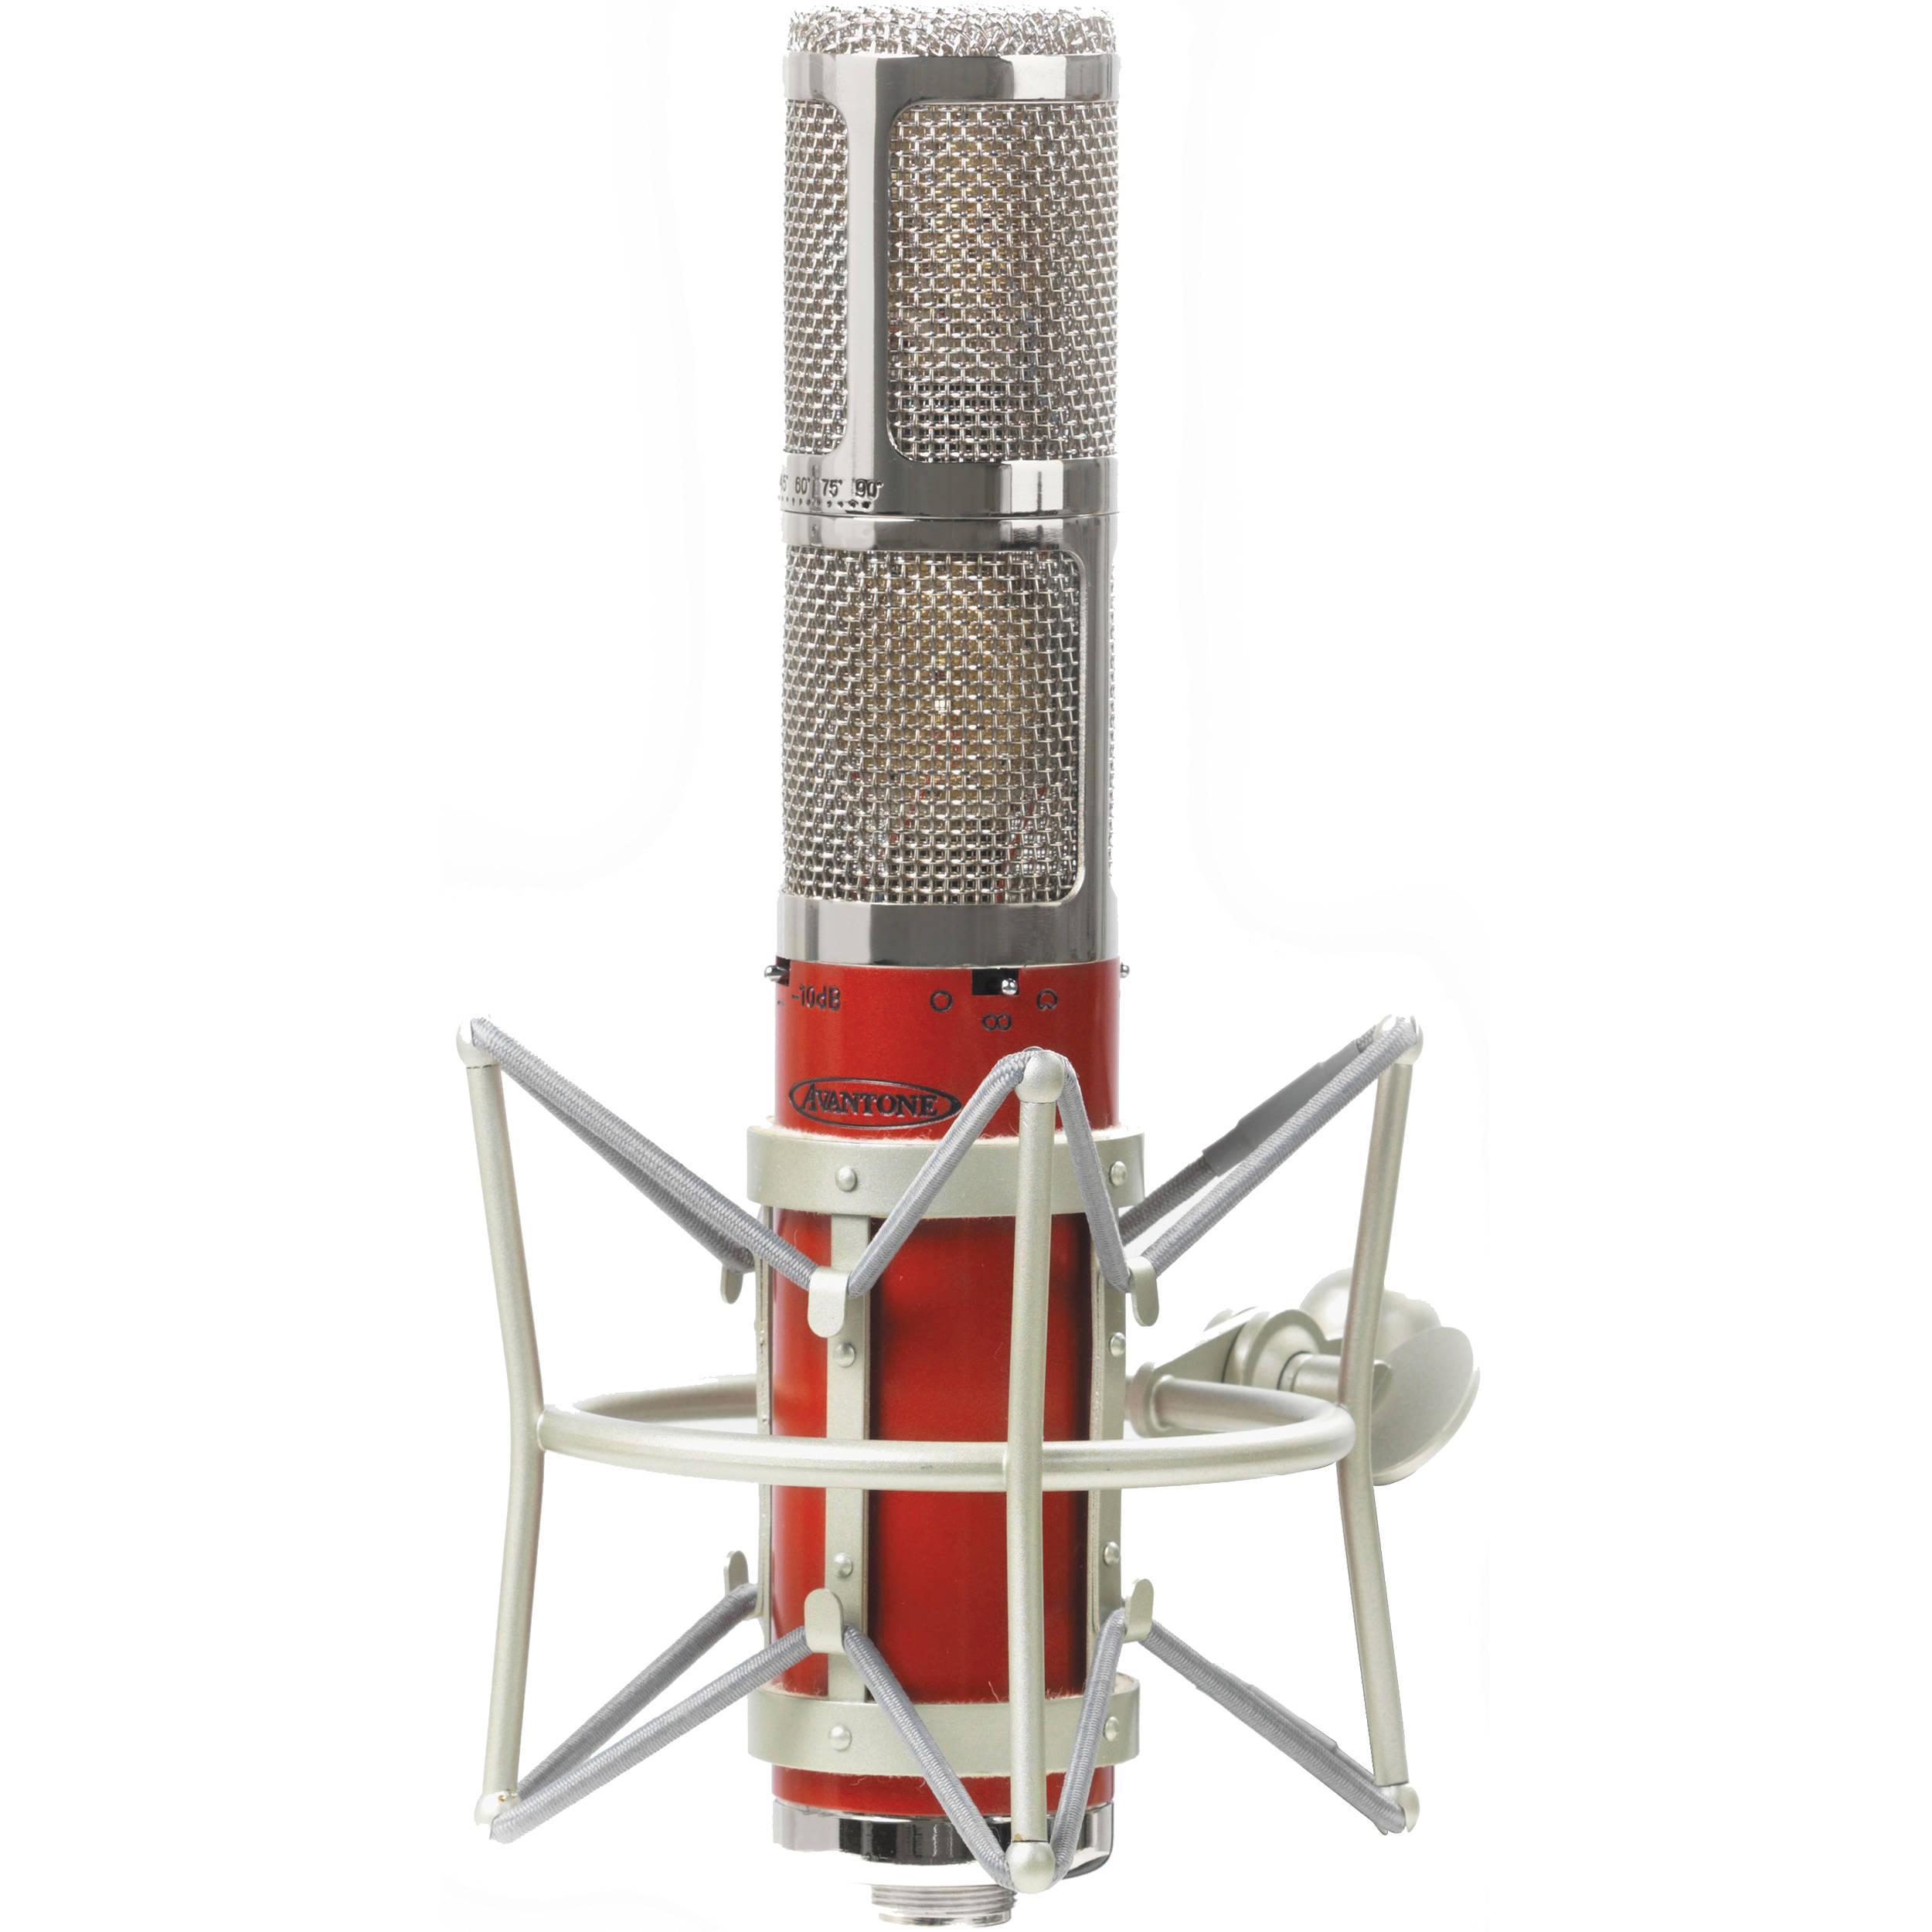 Extractor De Cocina CK 40F furthermore CK40 PLAFON NANDO 40ST » PLAFONY together with Stereo Microphone Patterns besides 当前位置 首页  gt  新闻资讯  gt  母猪产床尺寸设计图 moreover 1Pc Neue Turck Ni50 Ck40 Ap6x2 H1141 B97s R. on ck40